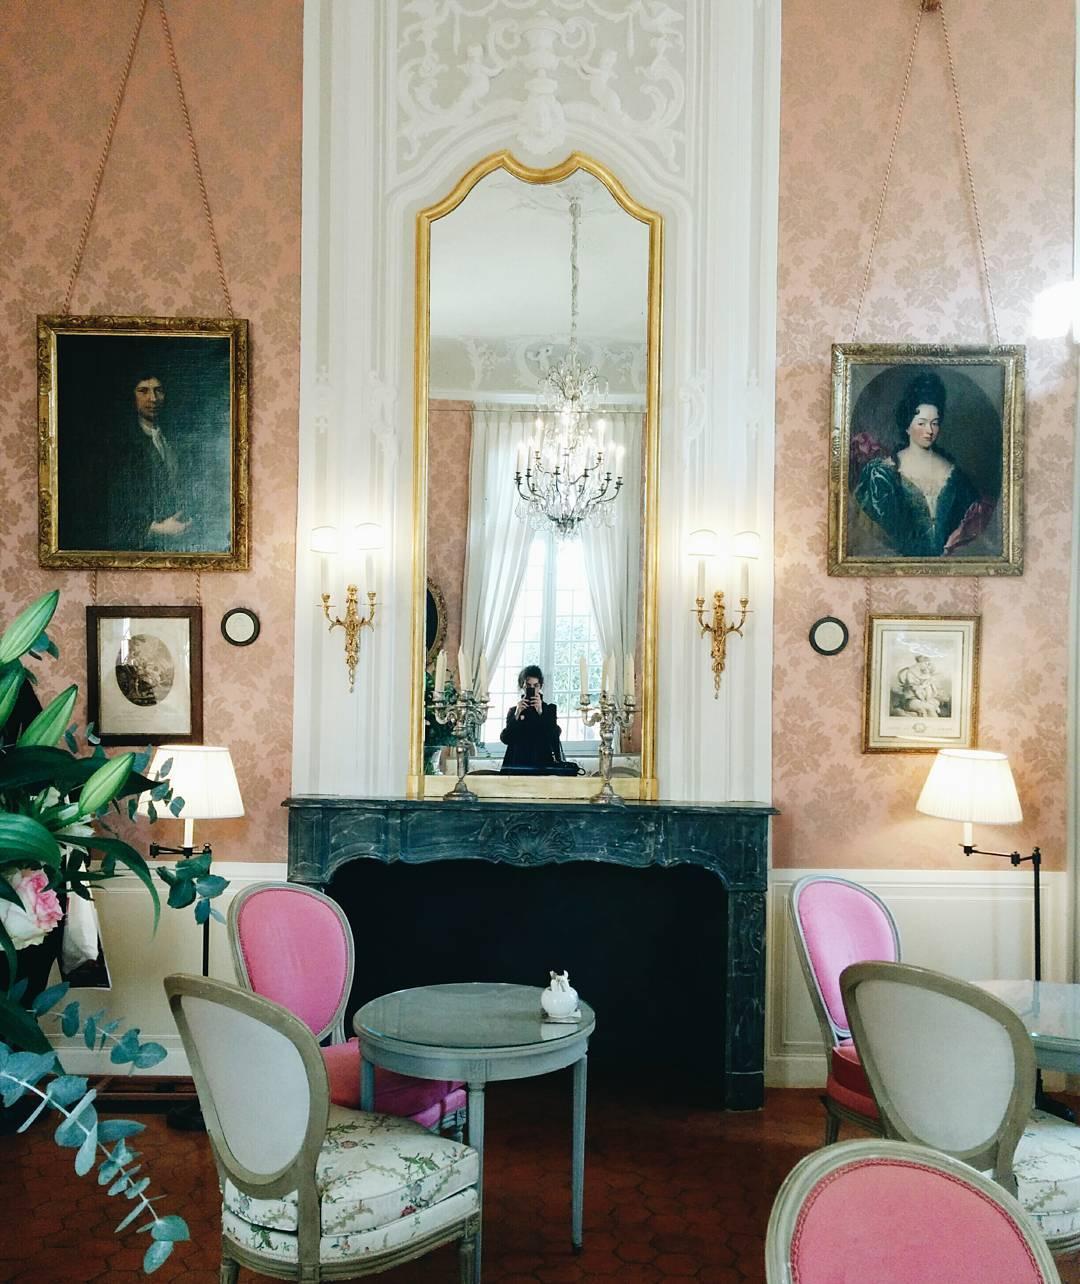 hotel de caumont aix en provence